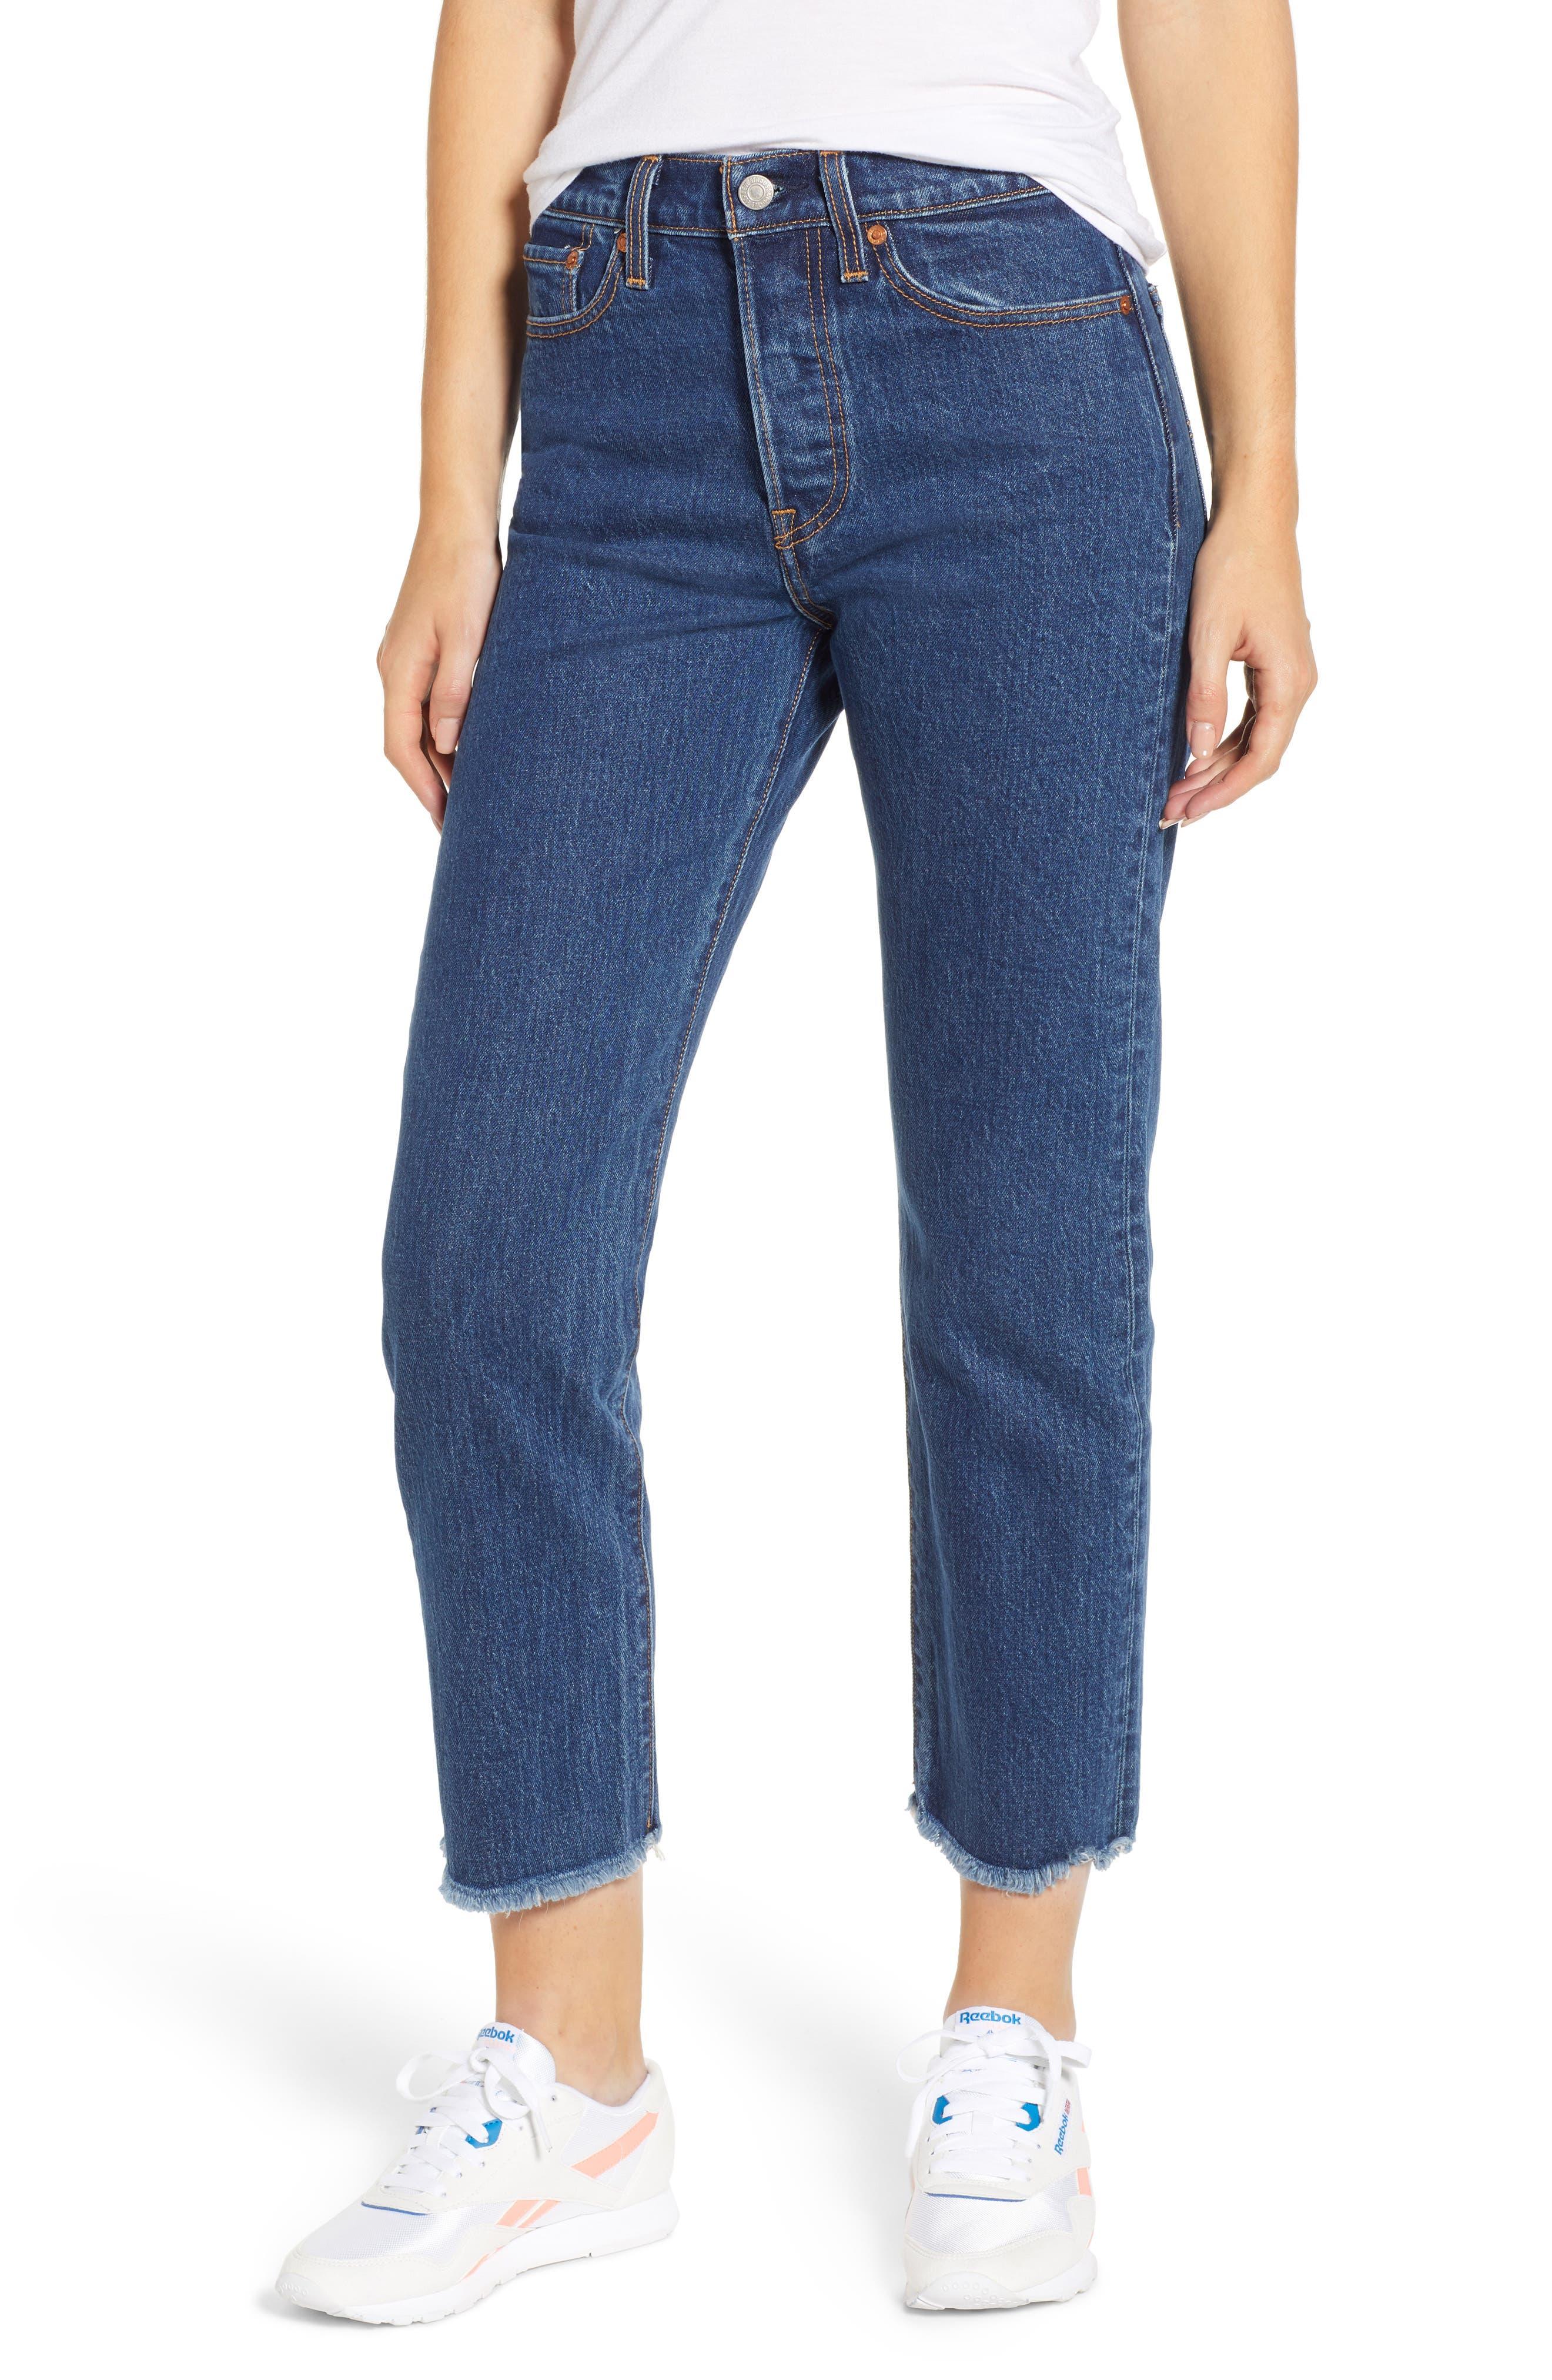 Women's Levi's Wedgie High Waist Ankle Straight Leg Jeans,  32 x 26 - Blue